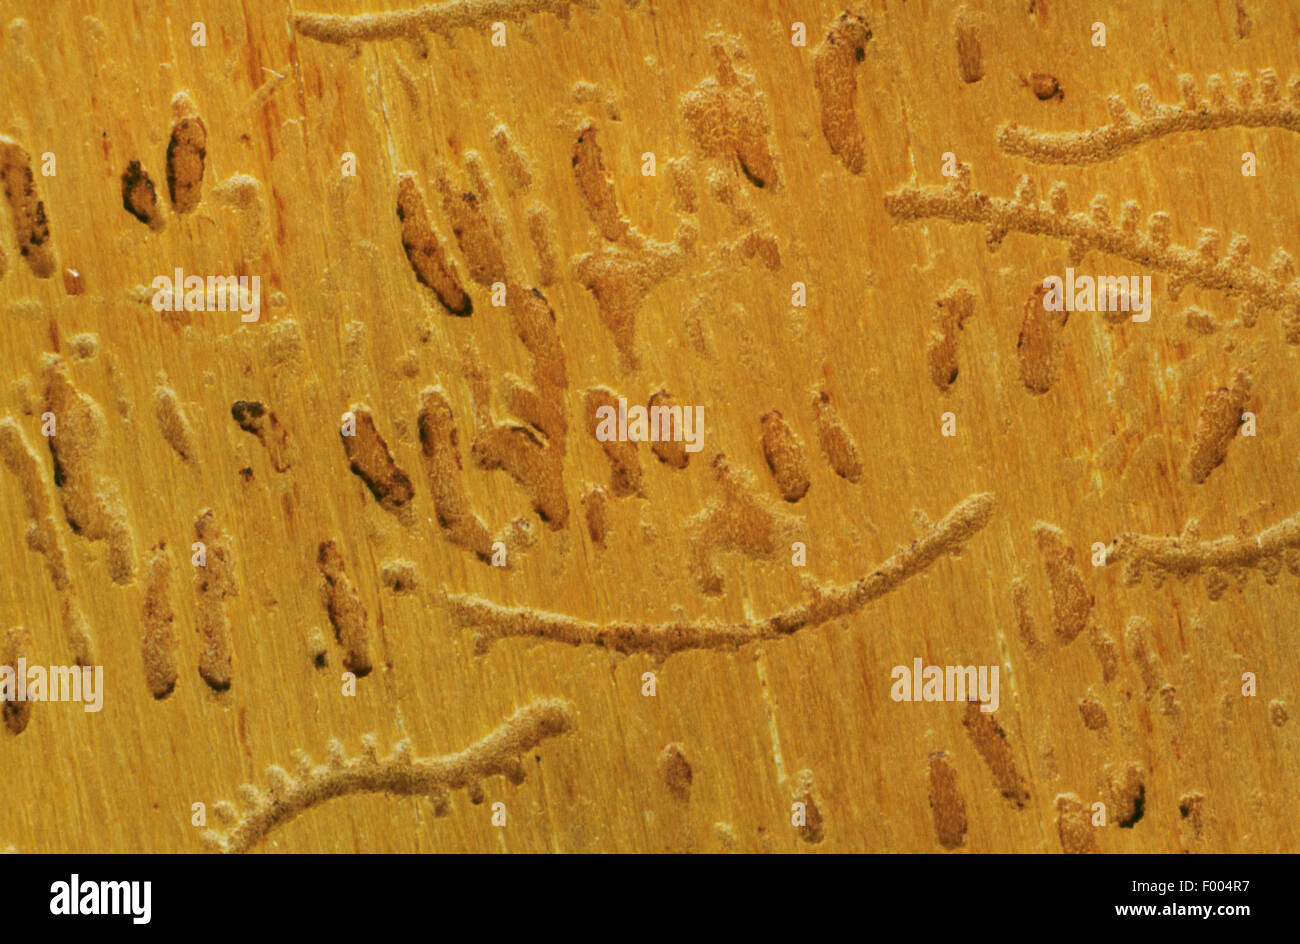 Six-dentated (Pityogenes chalcographus scolytes), Burrows dans le bois Photo Stock